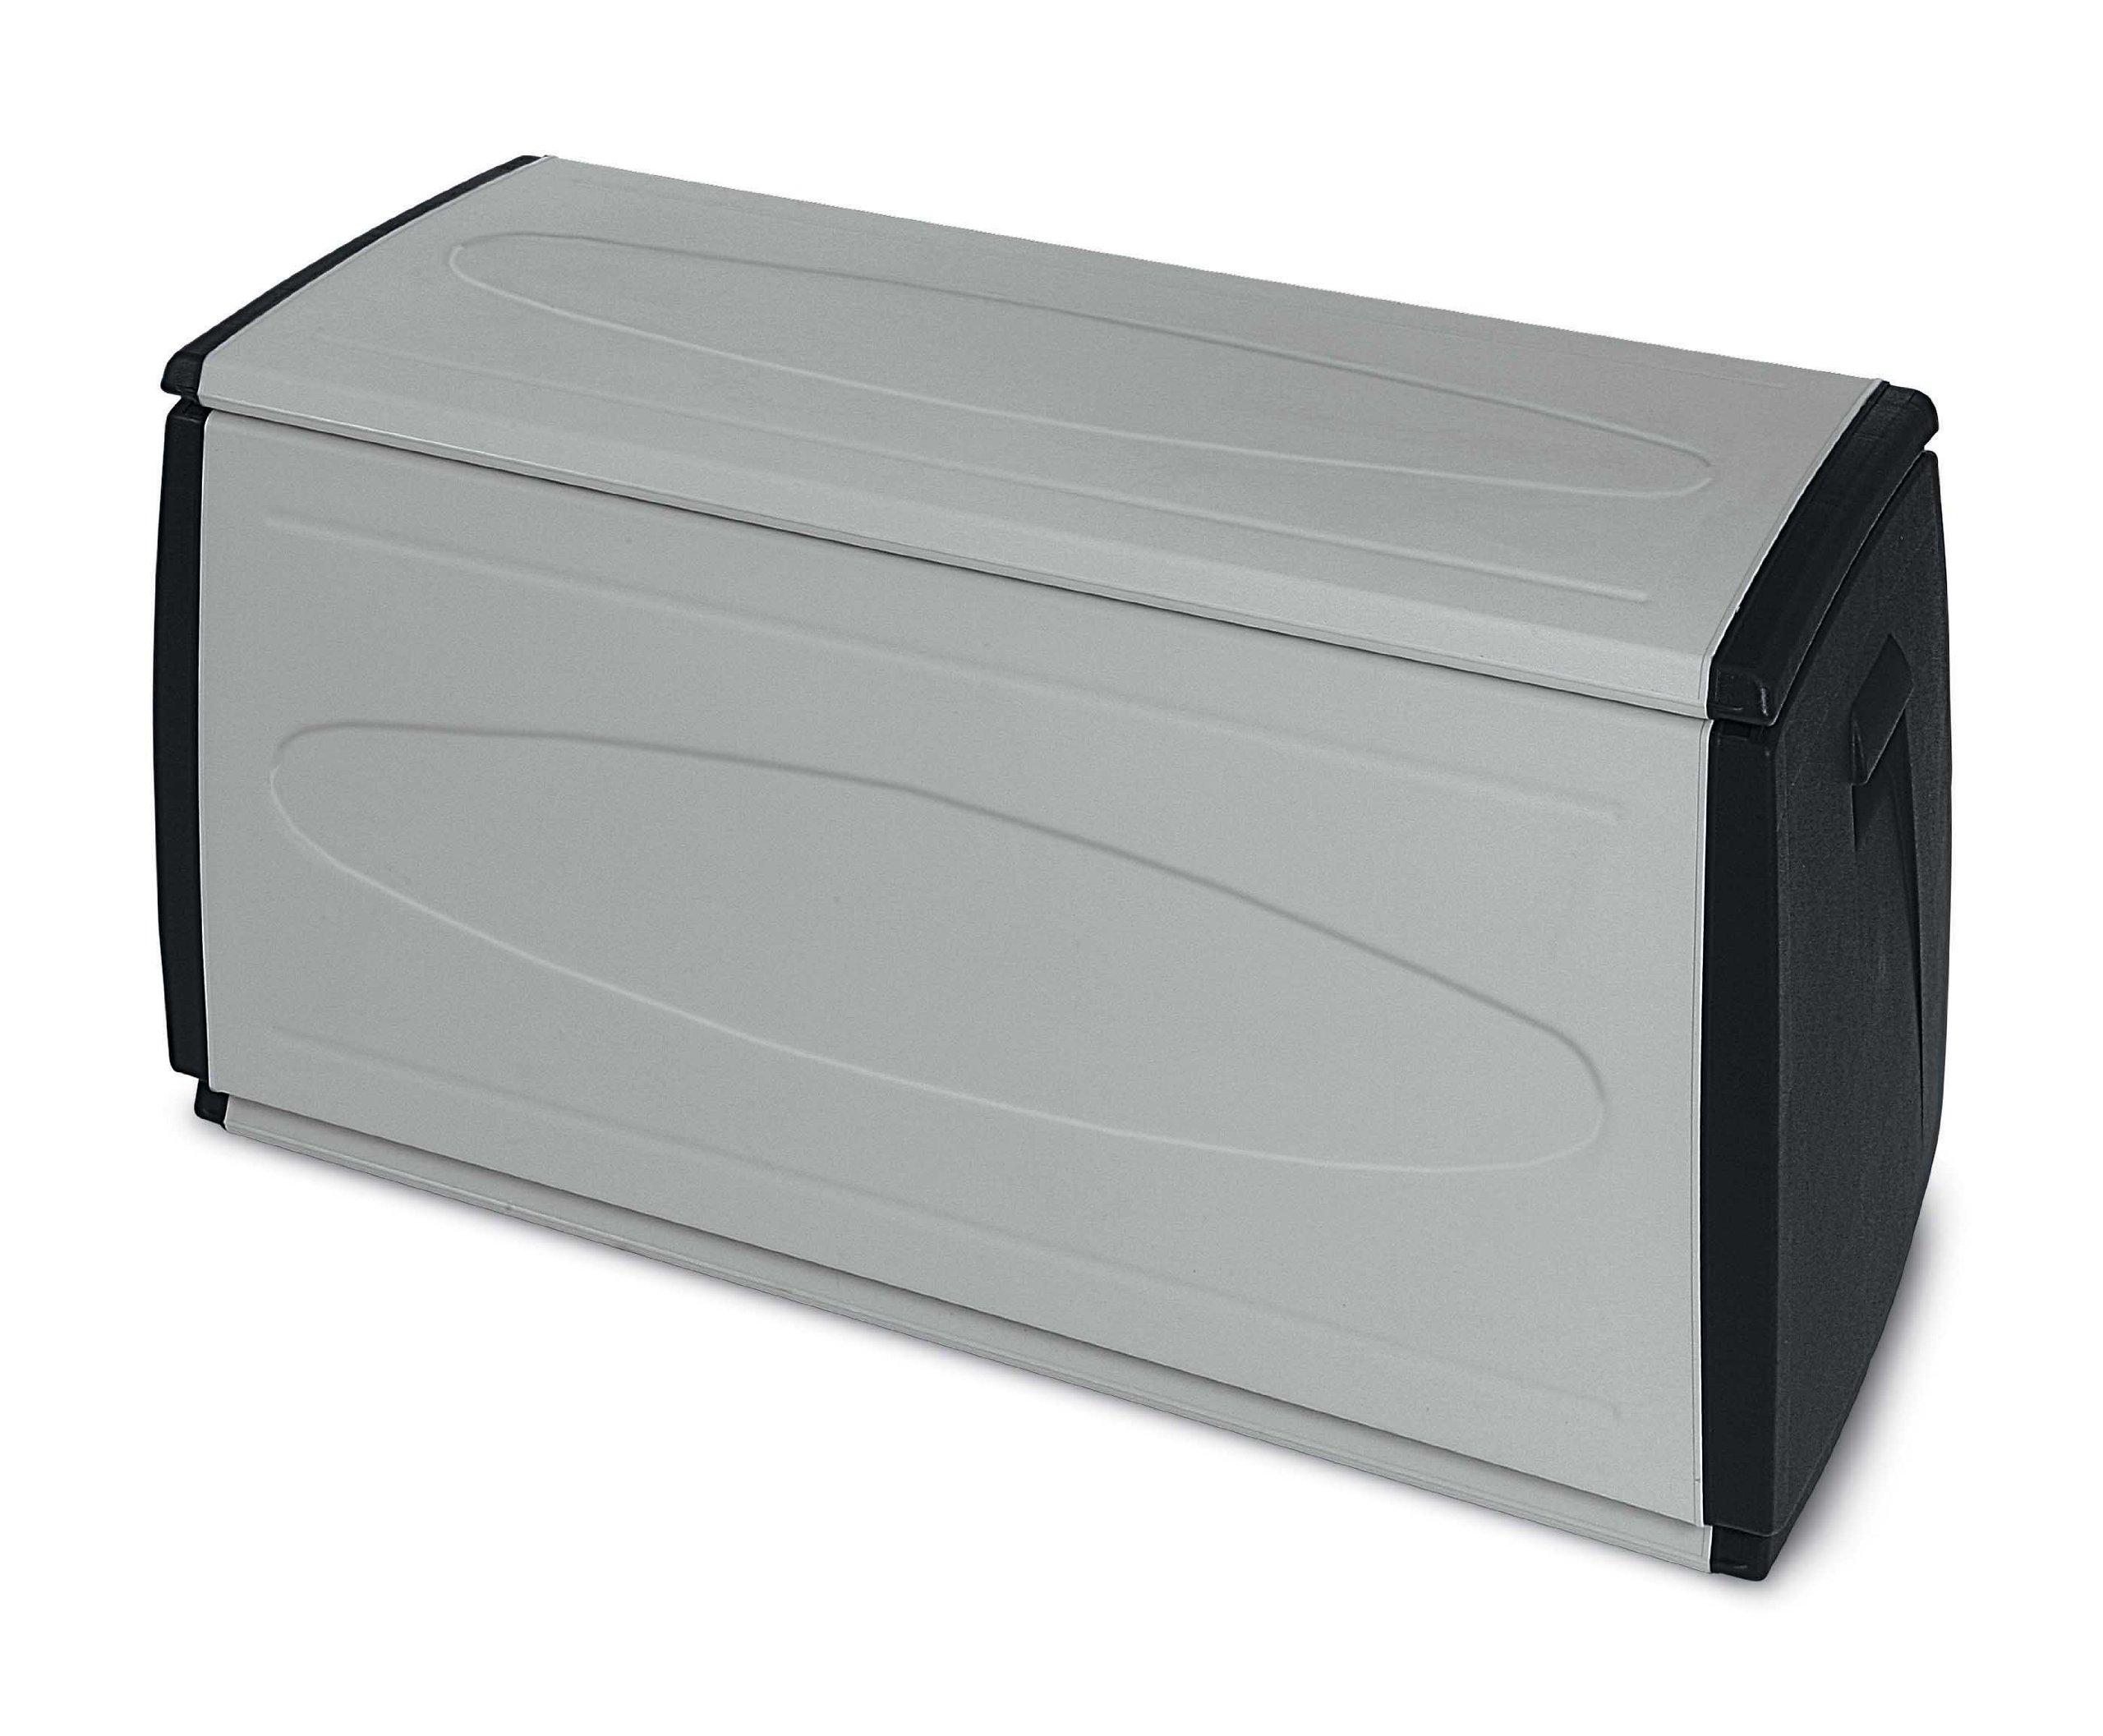 Terry-1101892-Prince-Box-120-QBlack-Baule-in-Plastica-GrigioNero-120-x-54-x-57-cm